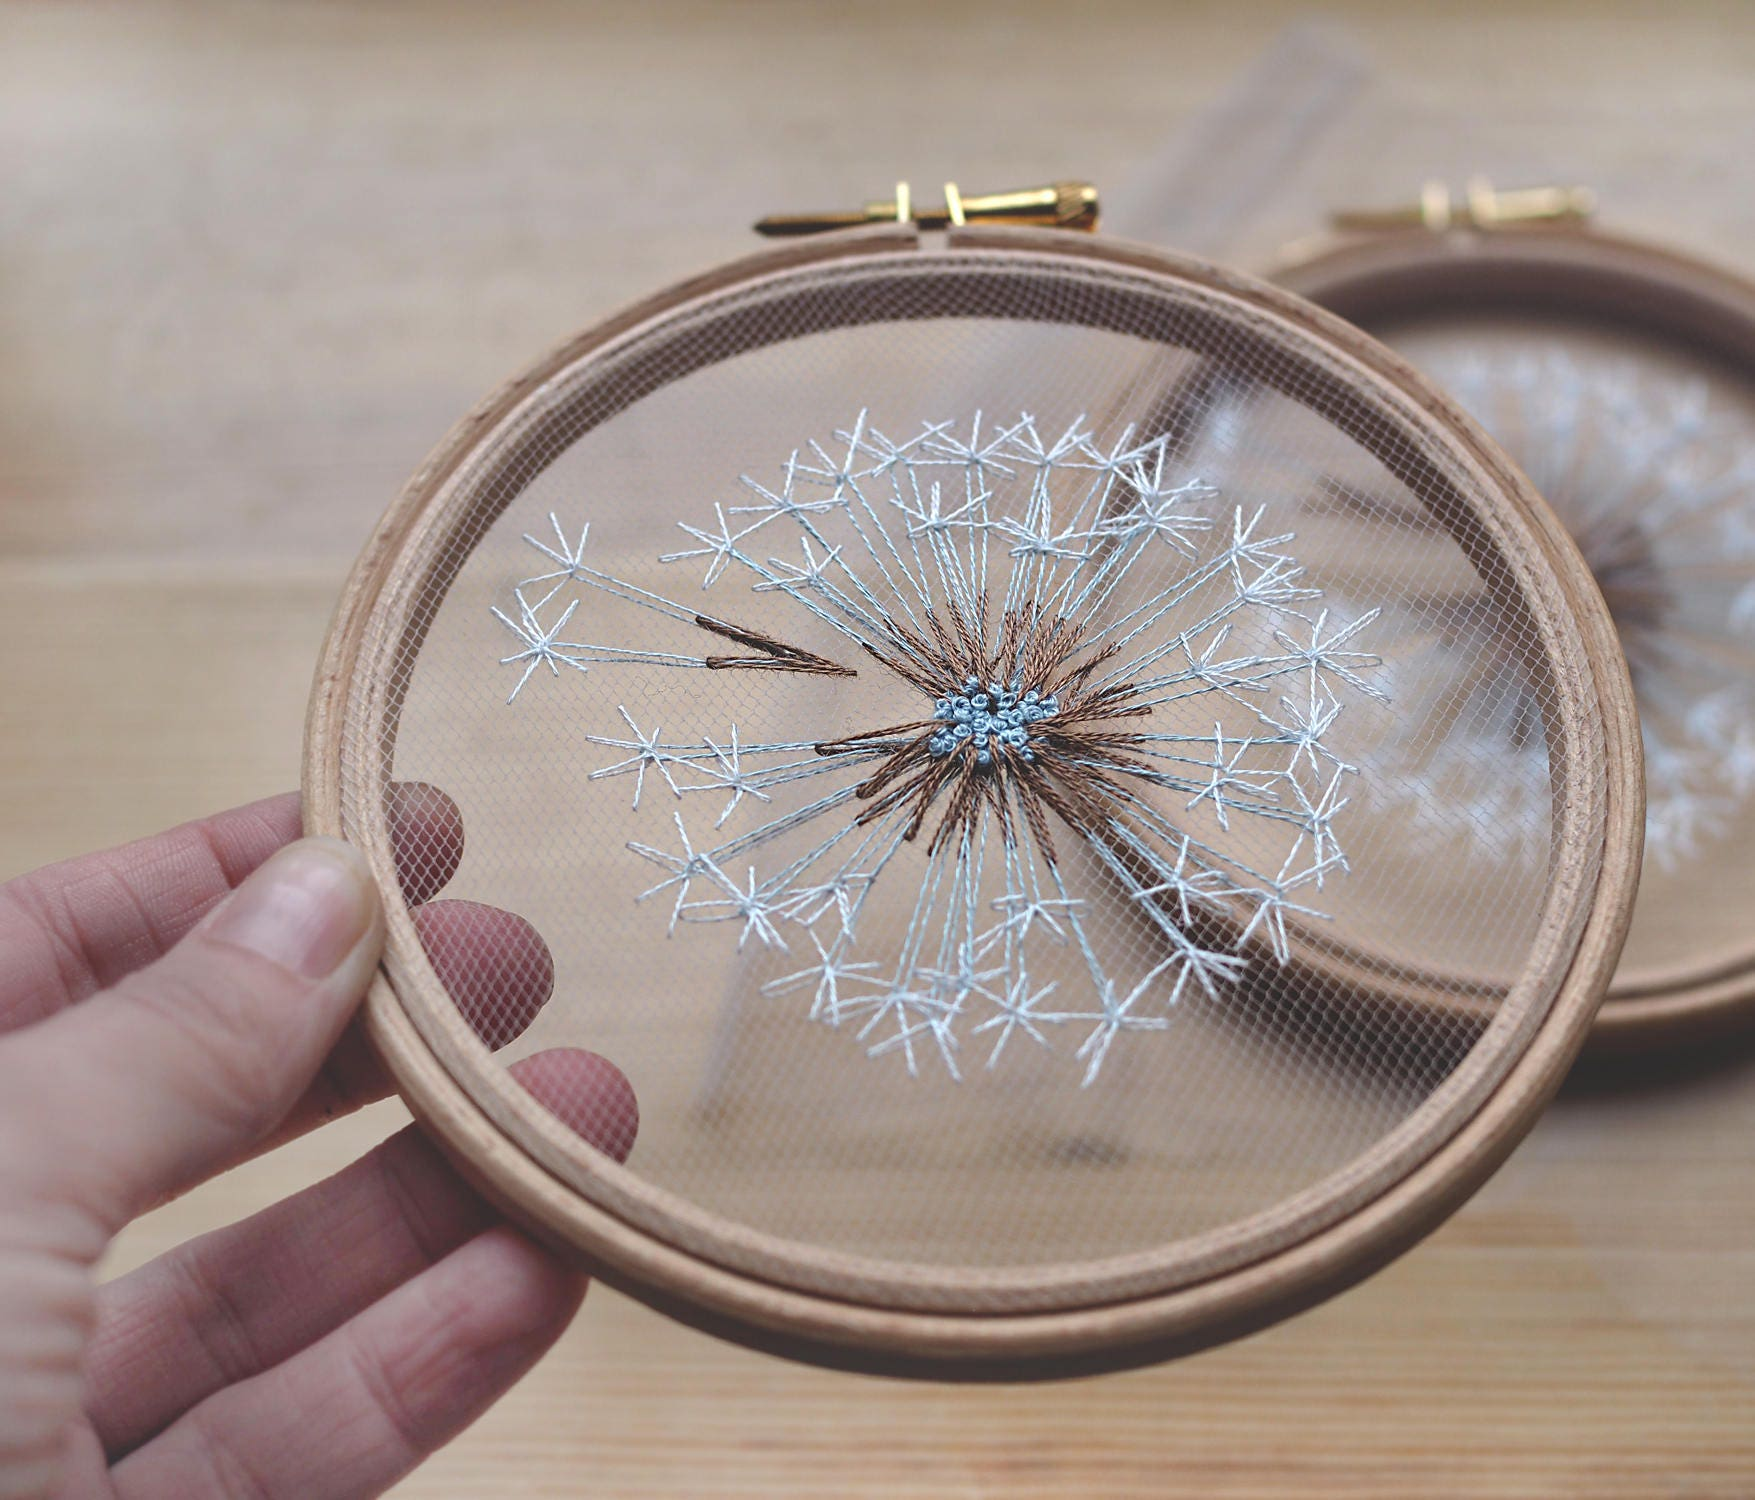 Make a wish dandelion tulle embroidery hoop art bridesmaid